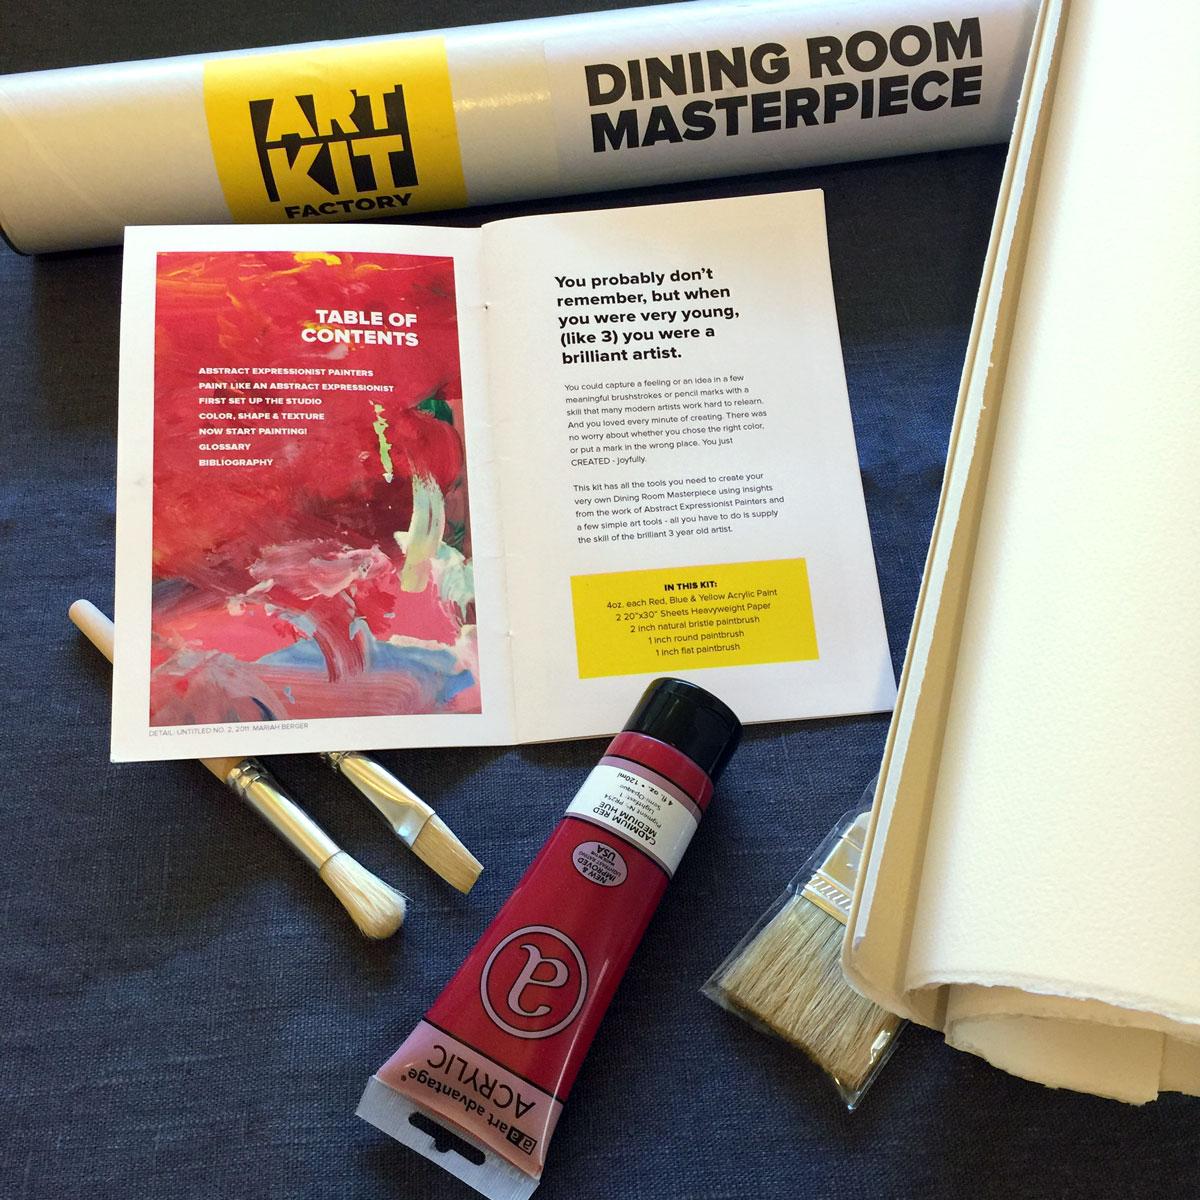 diningroommasterpiece2